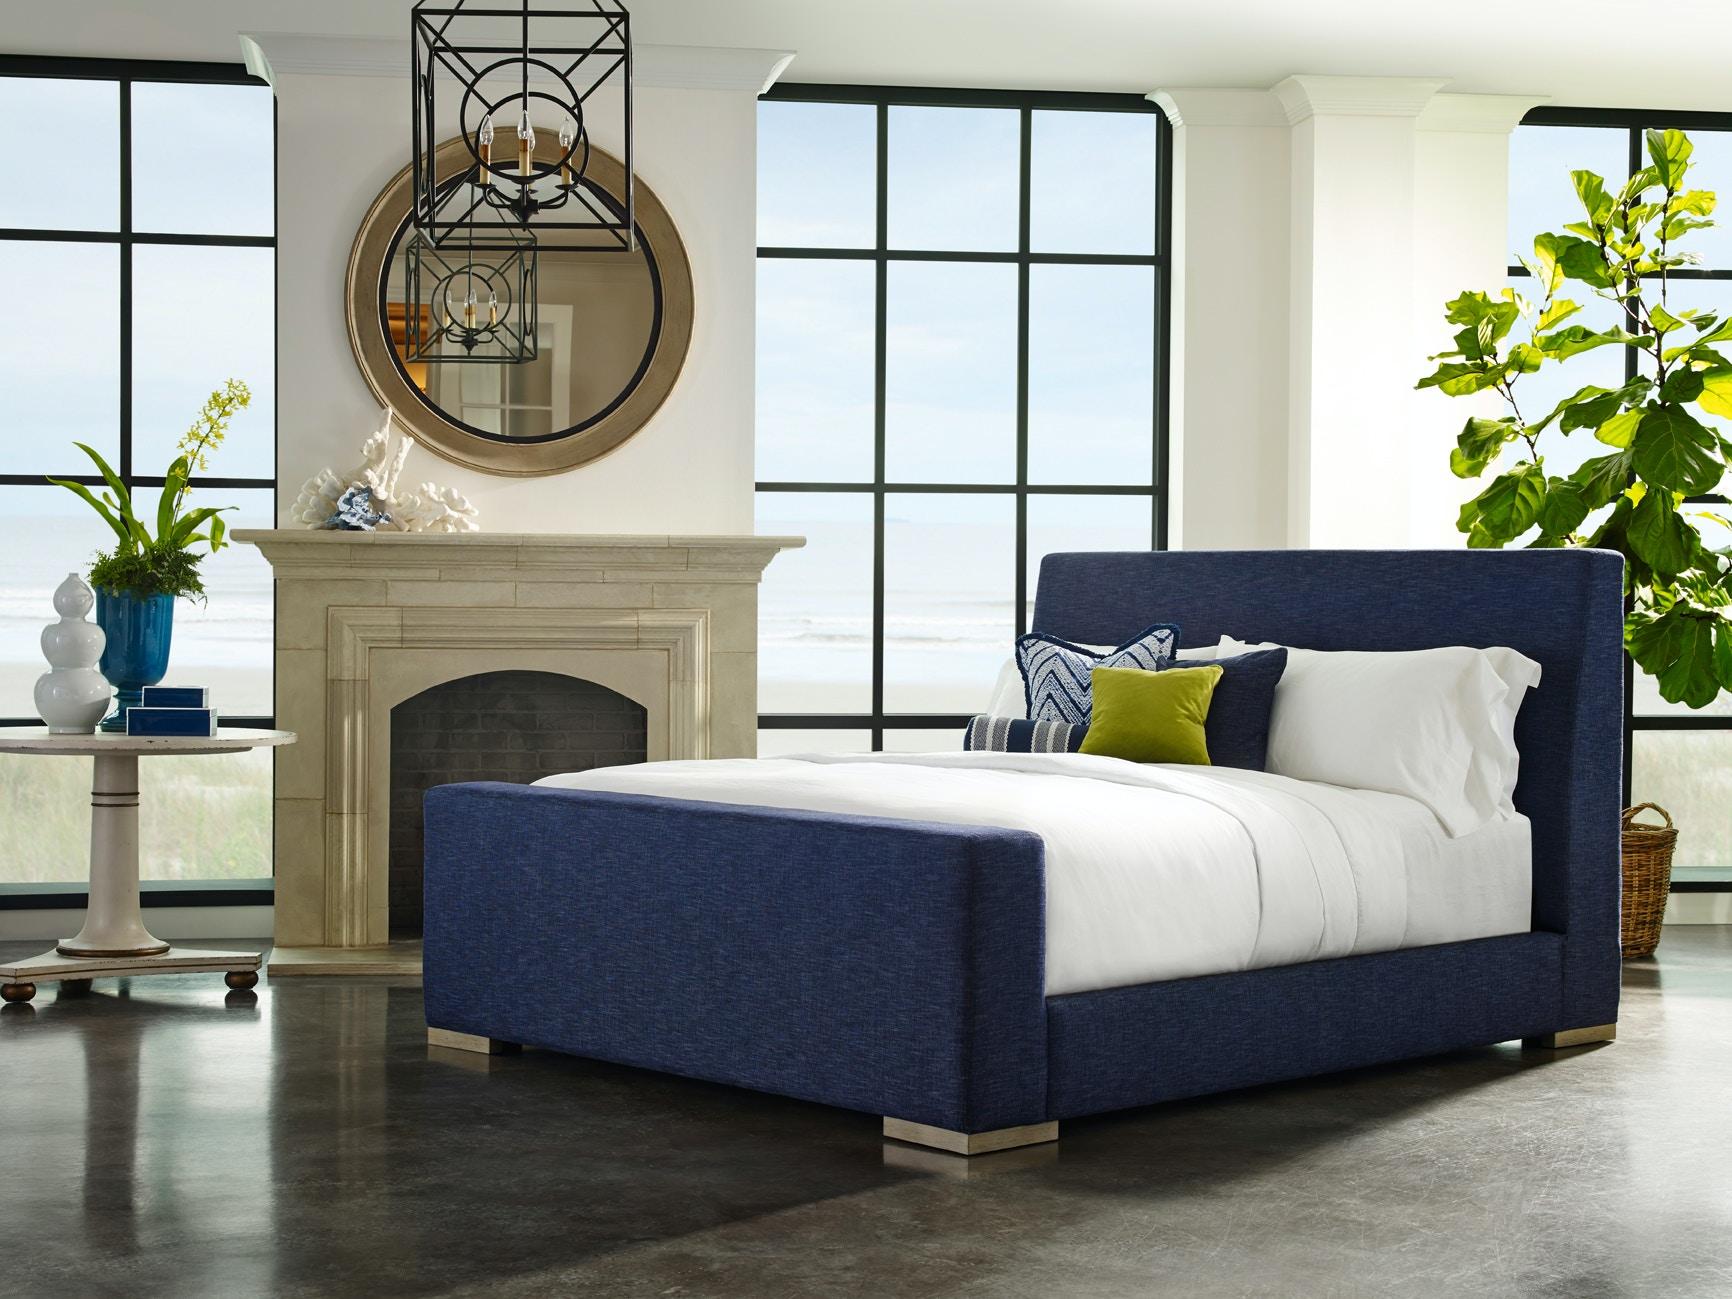 Lillian August Furniture Bedroom Lange Sleigh Bed La15523